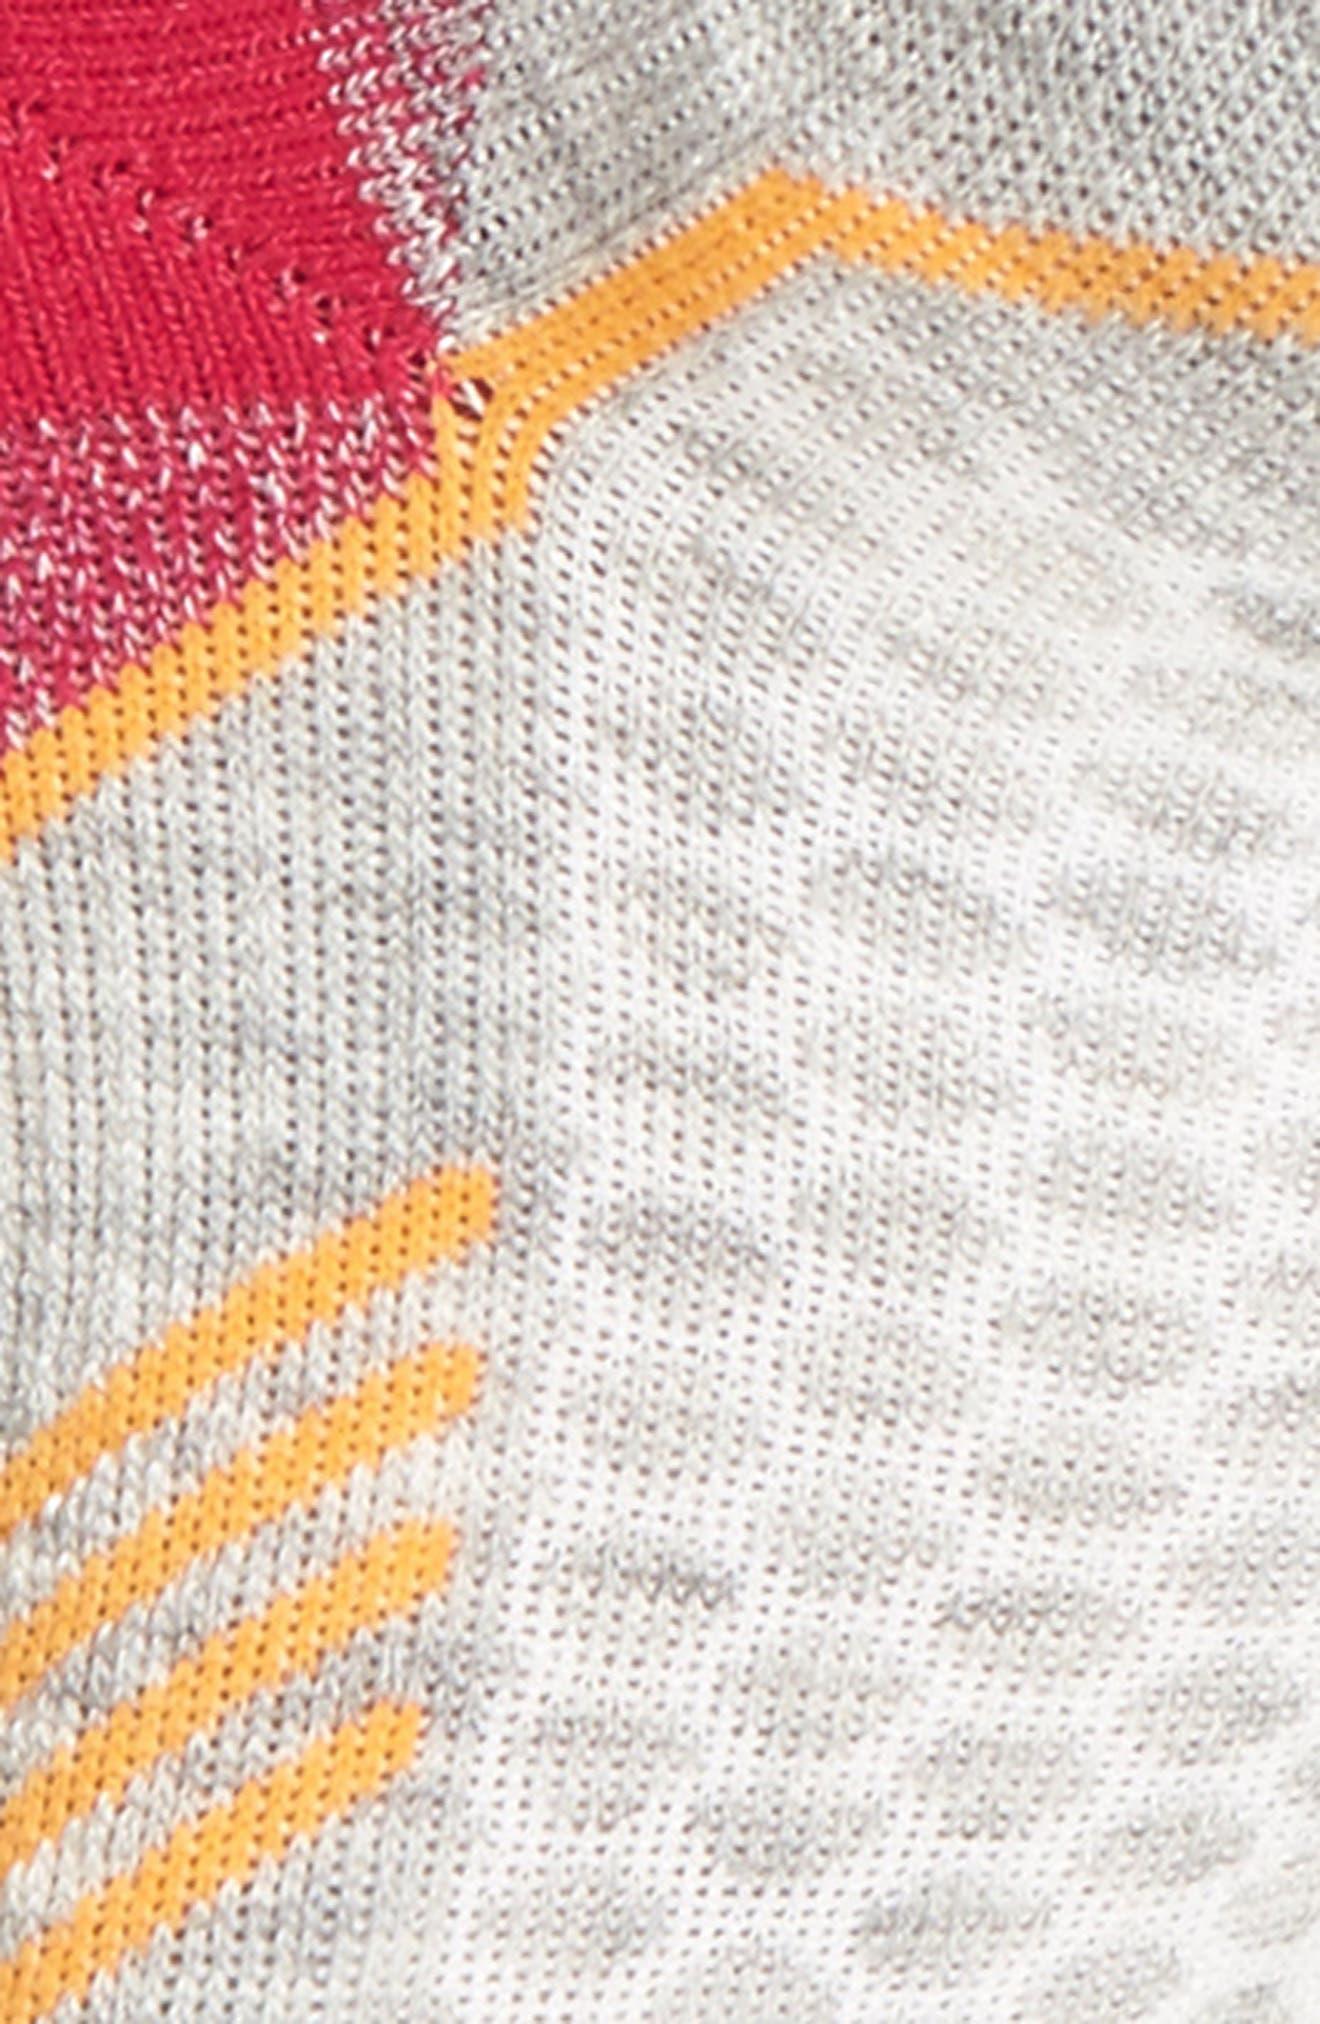 Incline Micro Compression Socks,                             Alternate thumbnail 2, color,                             LIGHT GREY